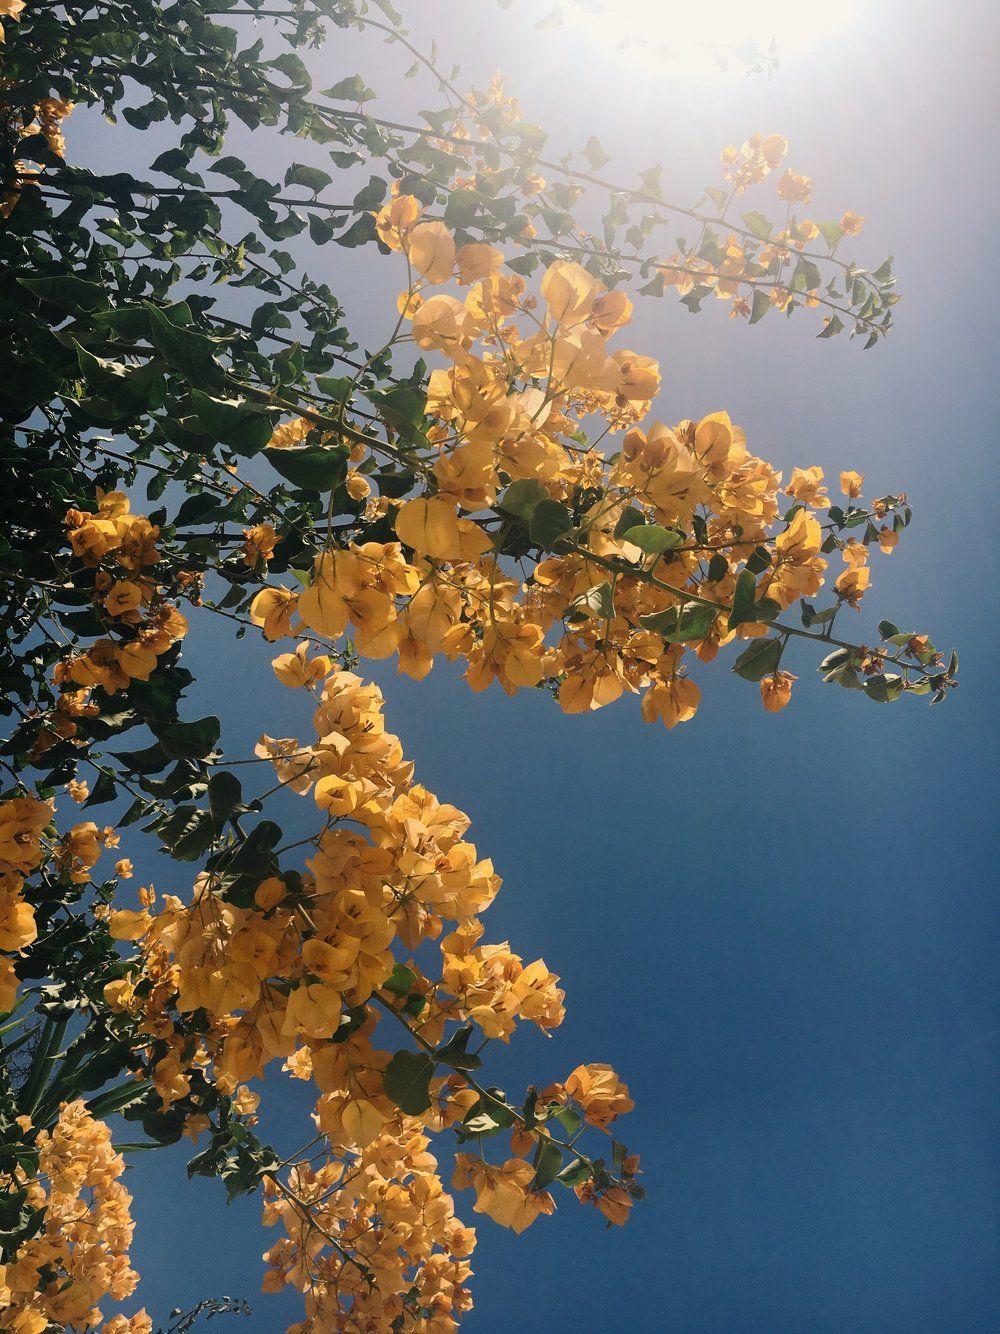 ᴍɪʀᴢʜɴᴀɴɪᴀᴀᴀ With Images Flower Aesthetic Nature